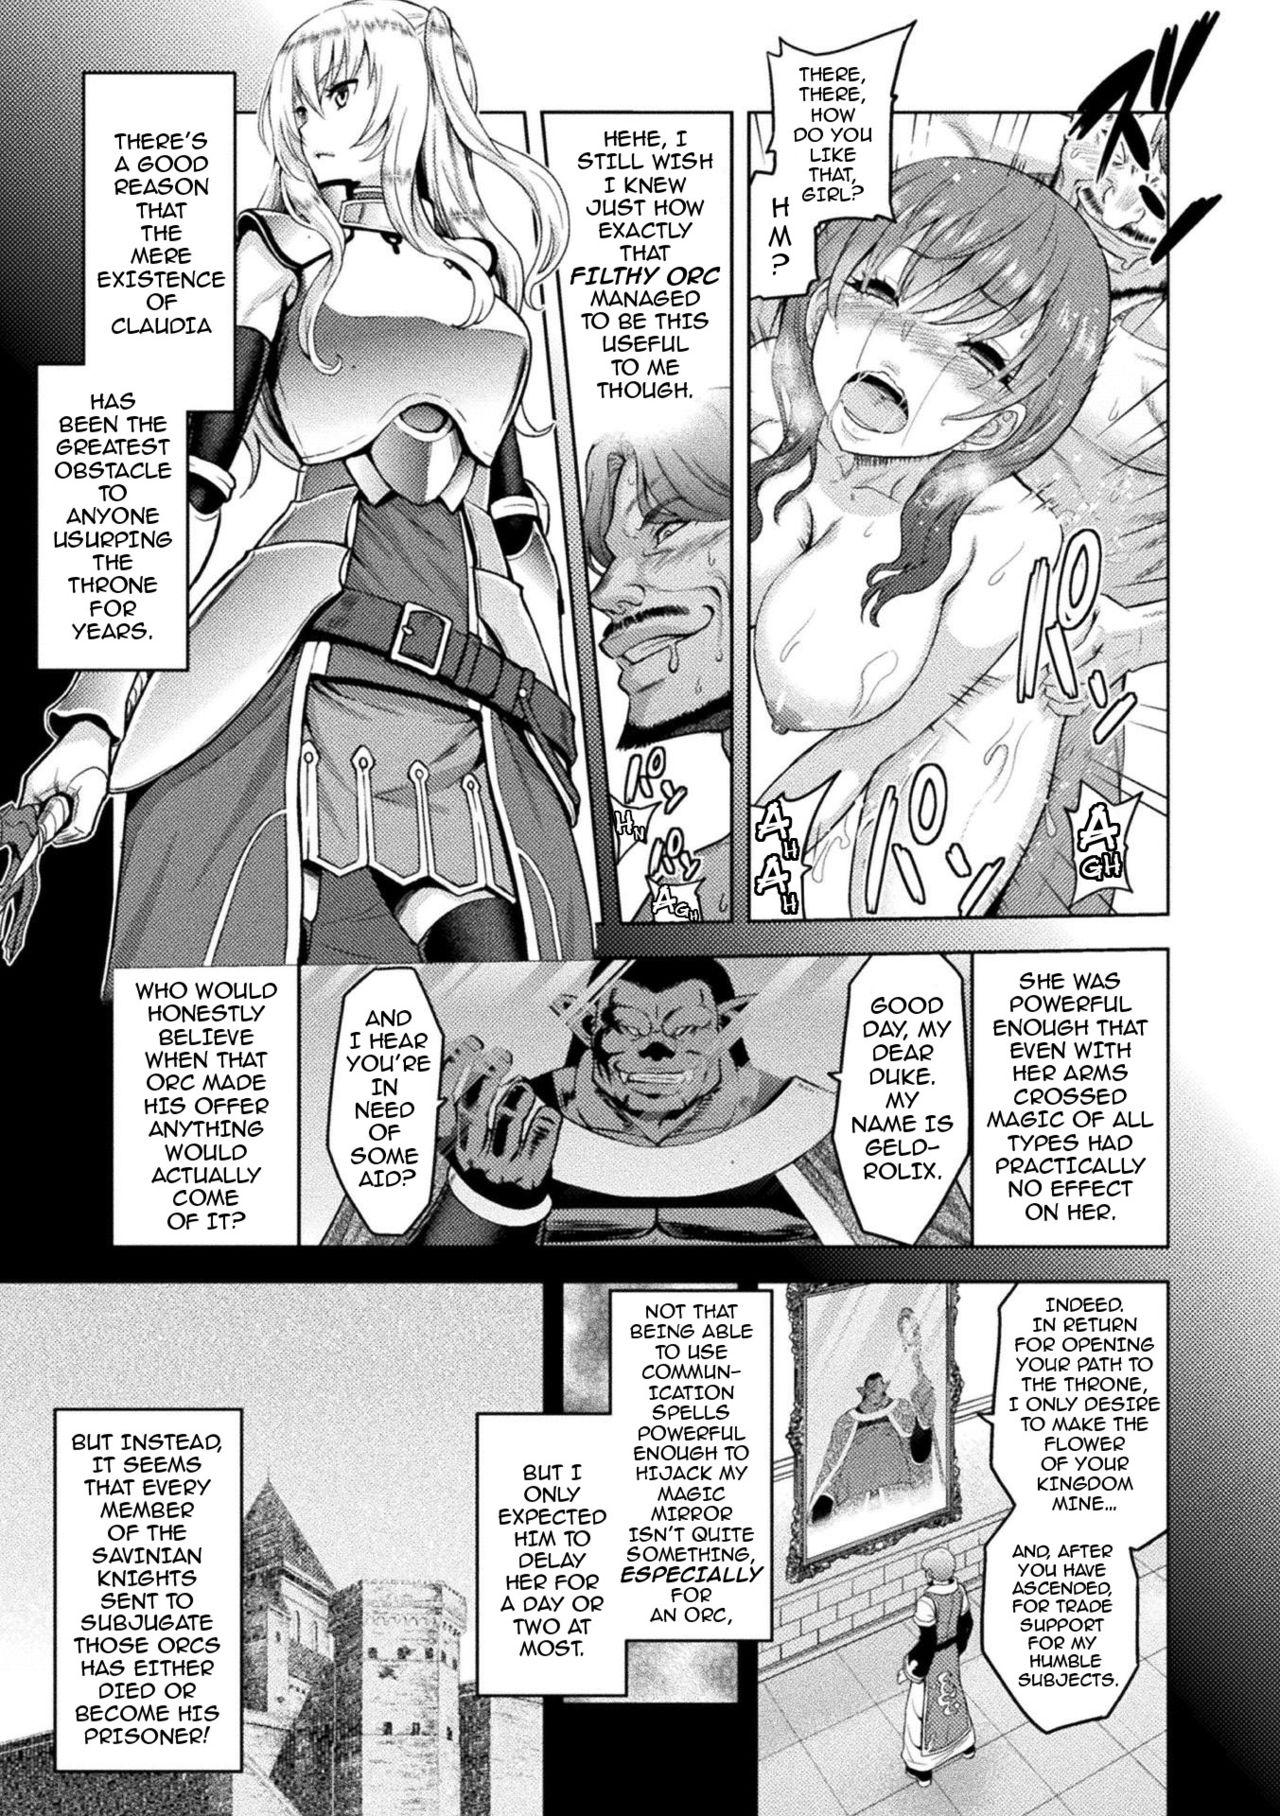 [Yamada Gogogo] Erona ~Orc no Inmon ni Okasareta Onna Kishi no Matsuro~ | Erona ~The Fall of a Beautiful Knight Cursed with the Lewd Mark of an Orc~ [English] {darknight} 77